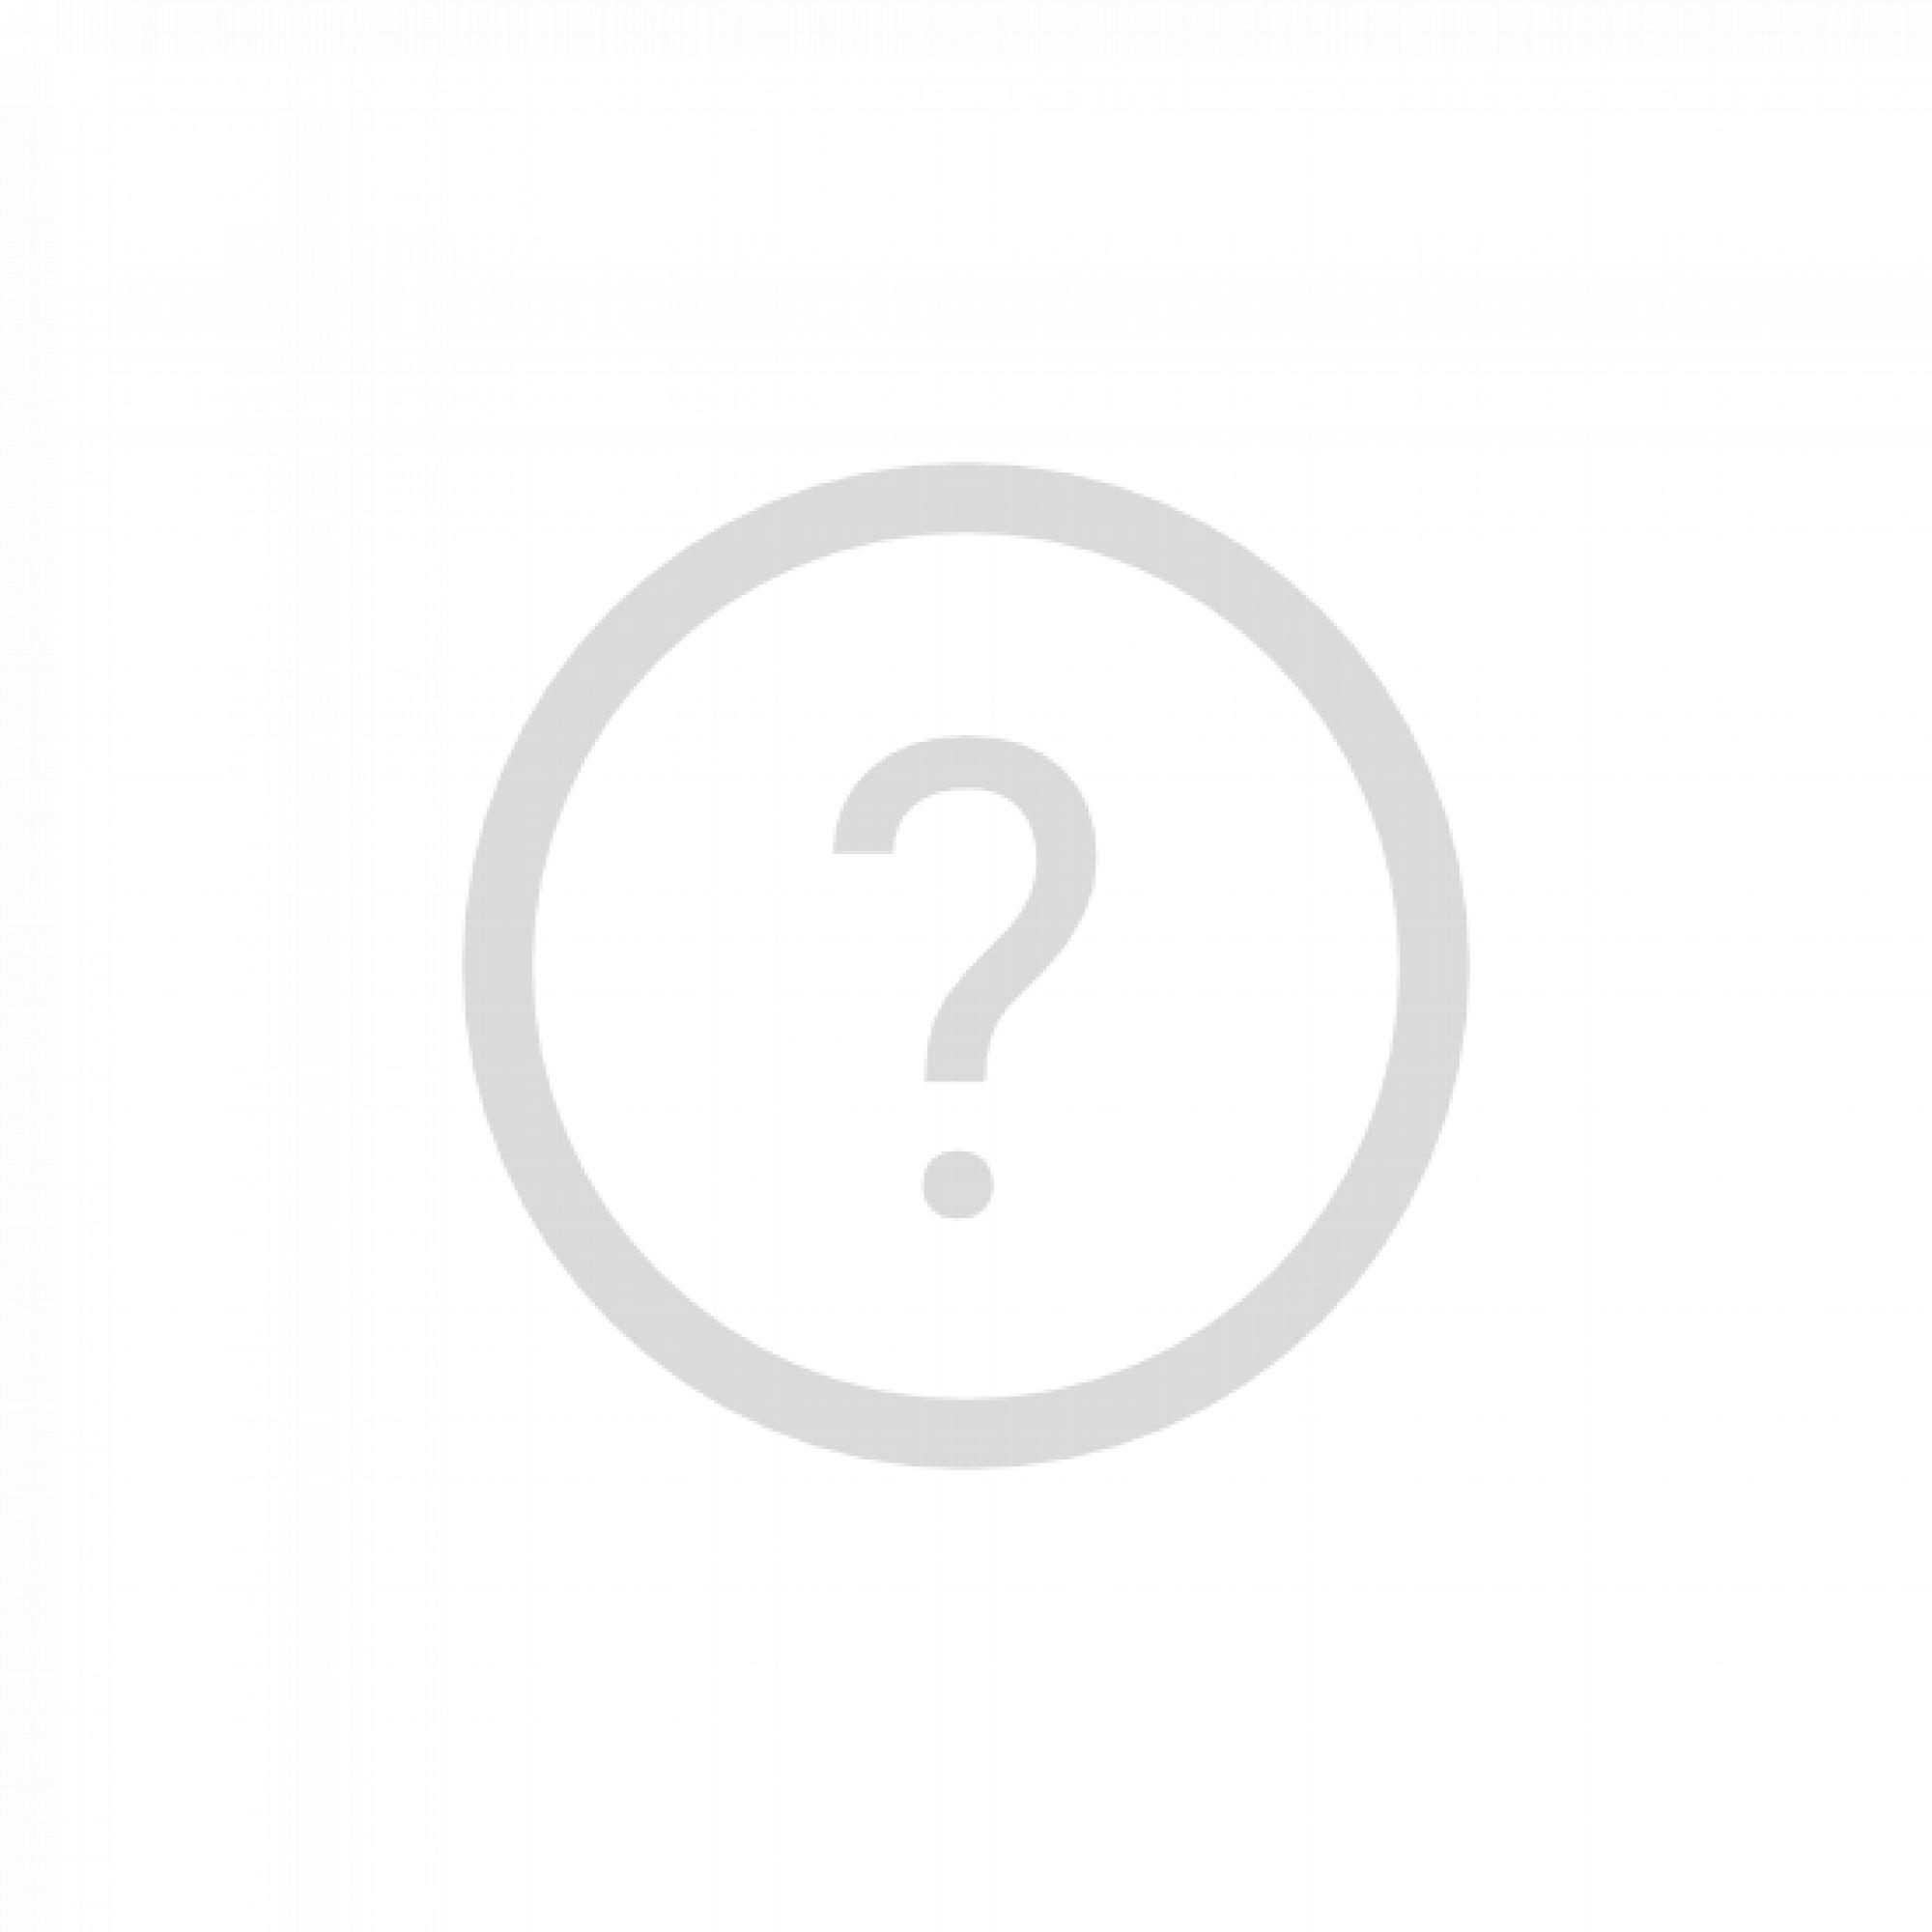 oxigin 18 concave felgen black foil white felgenbett und. Black Bedroom Furniture Sets. Home Design Ideas